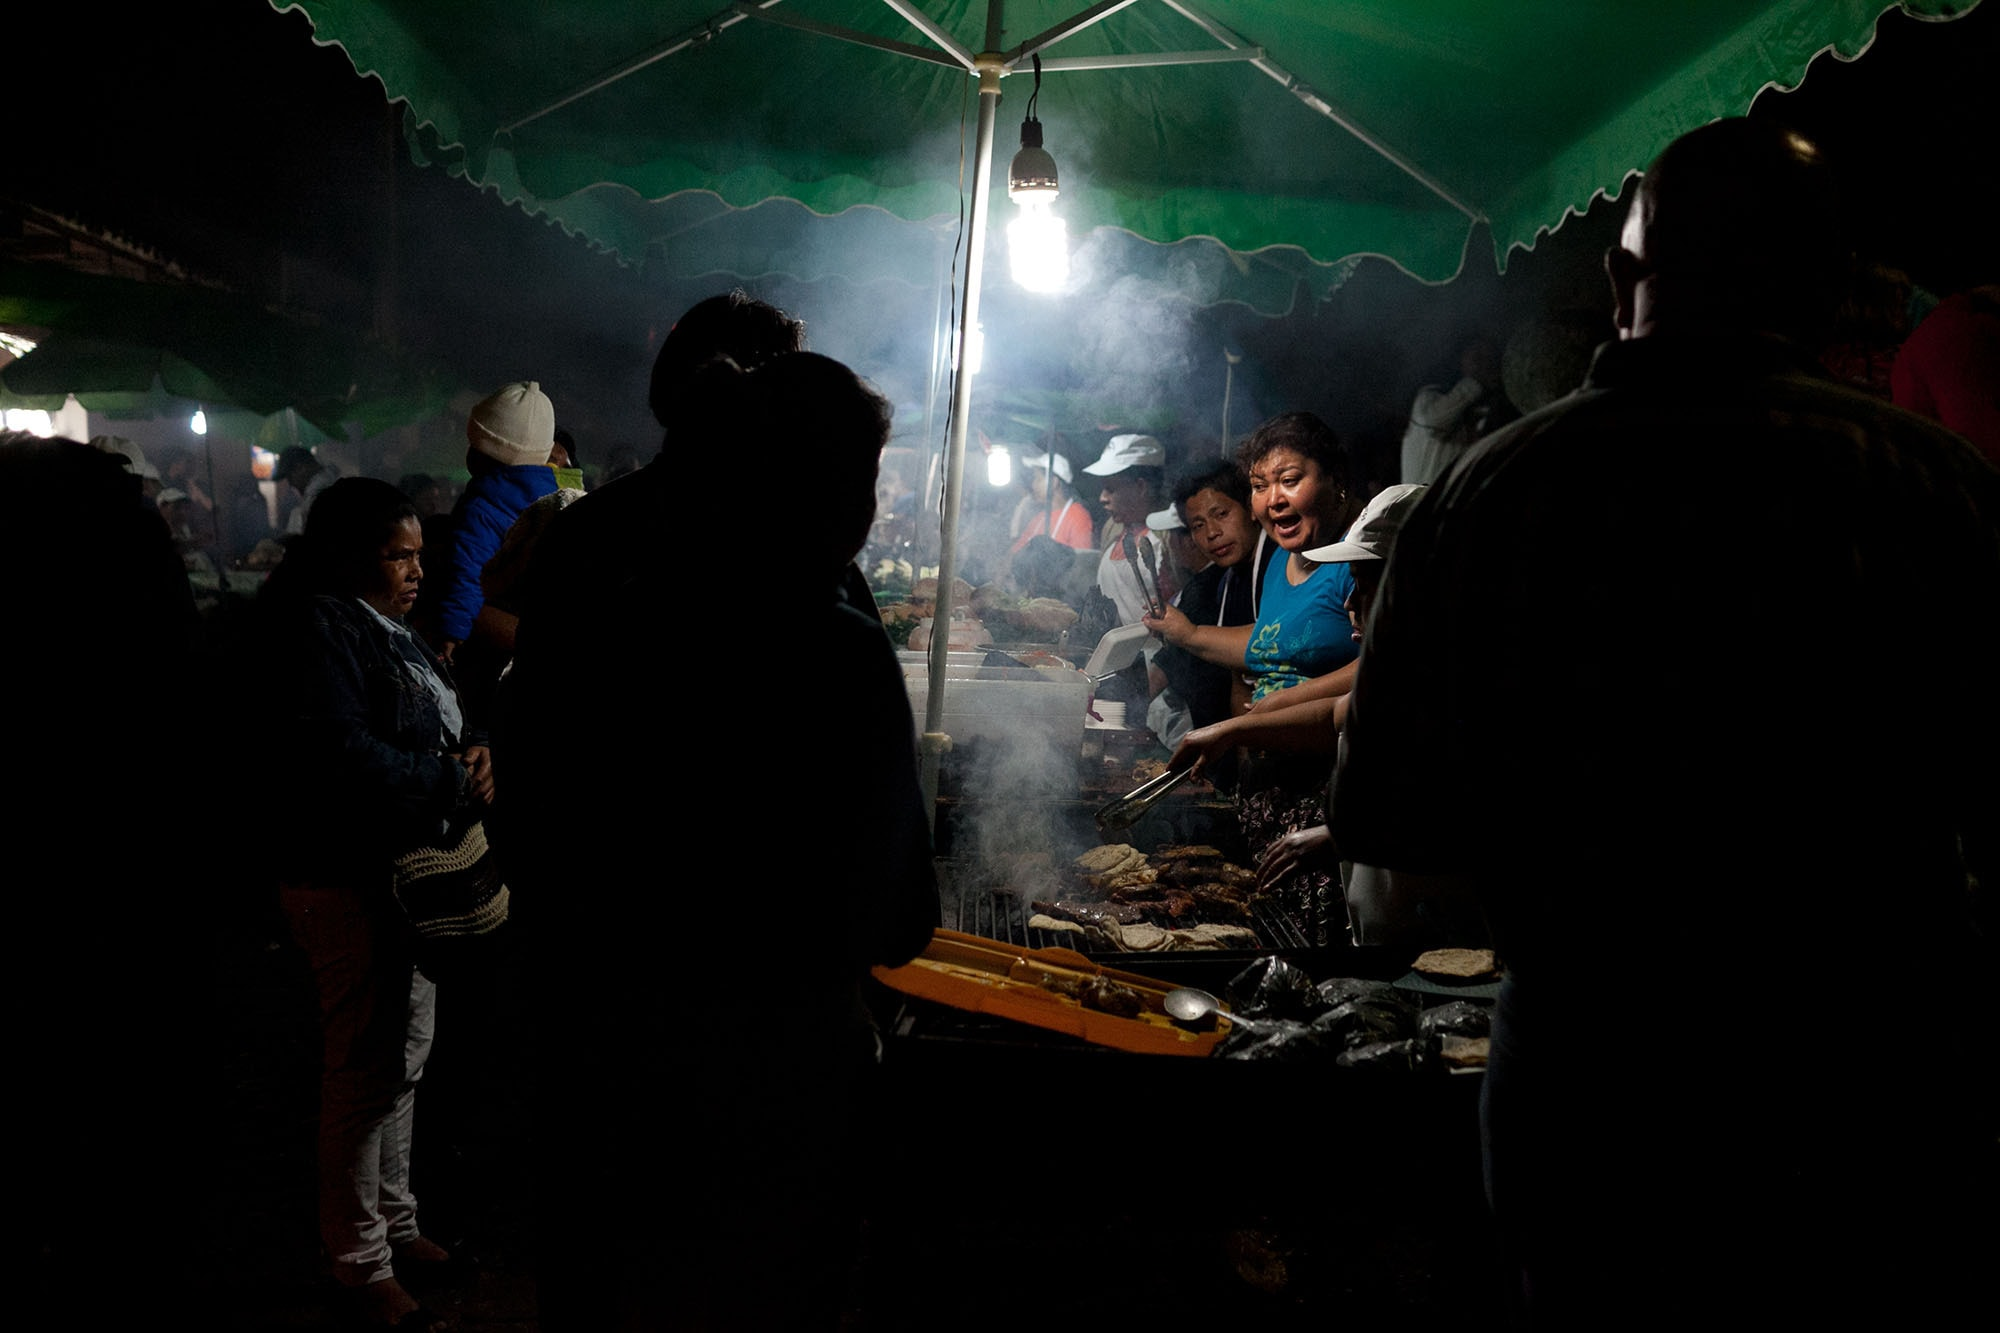 Night market in Antigua, Guatemala